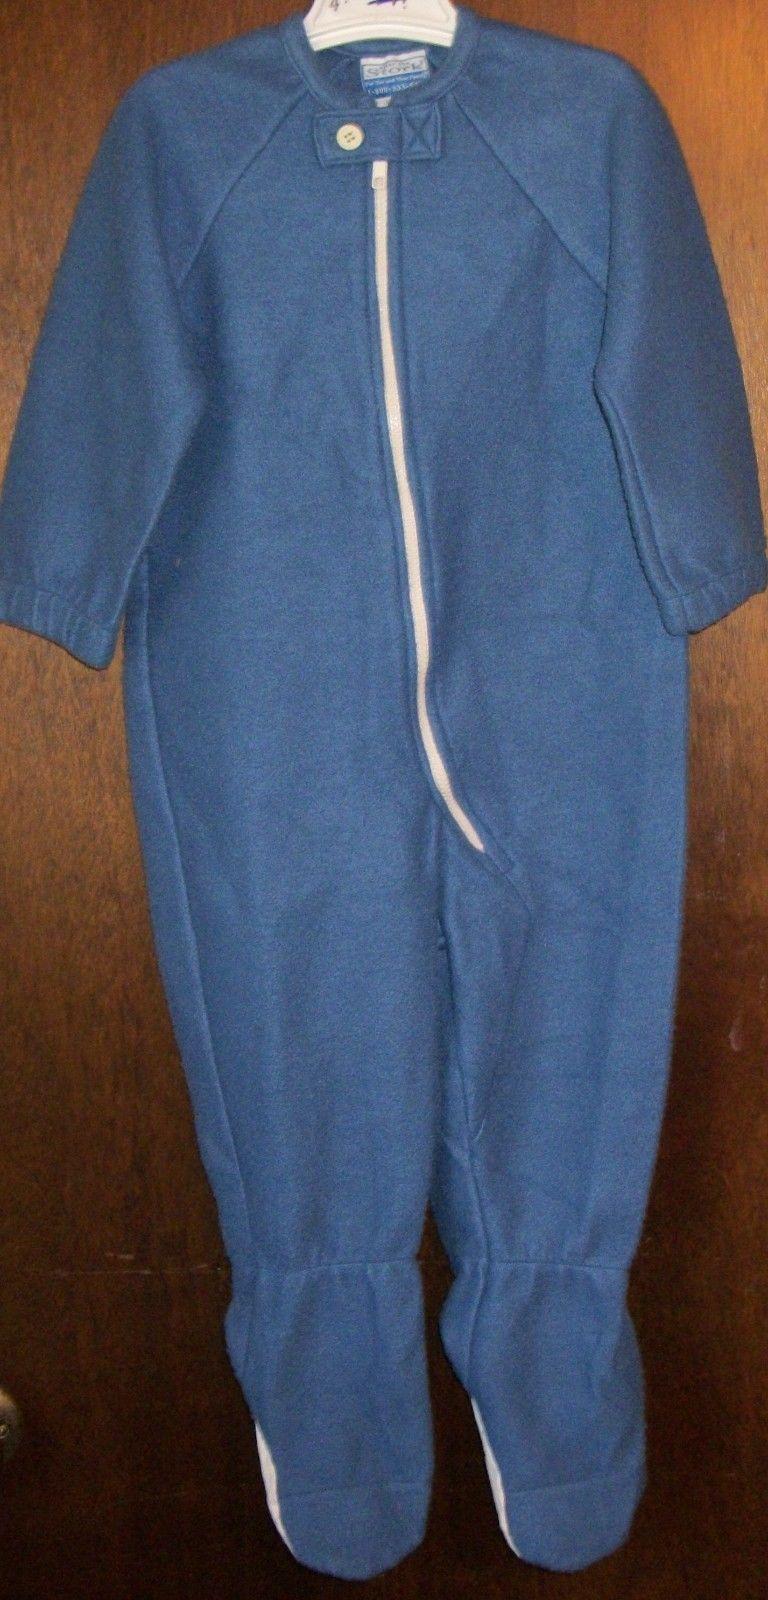 Boys Blanket Sleeper sz 4T AFTER THE STORK Solid Blue Polyester Fleece NWT  | Blanket sleeper, Boy blankets, Fleece